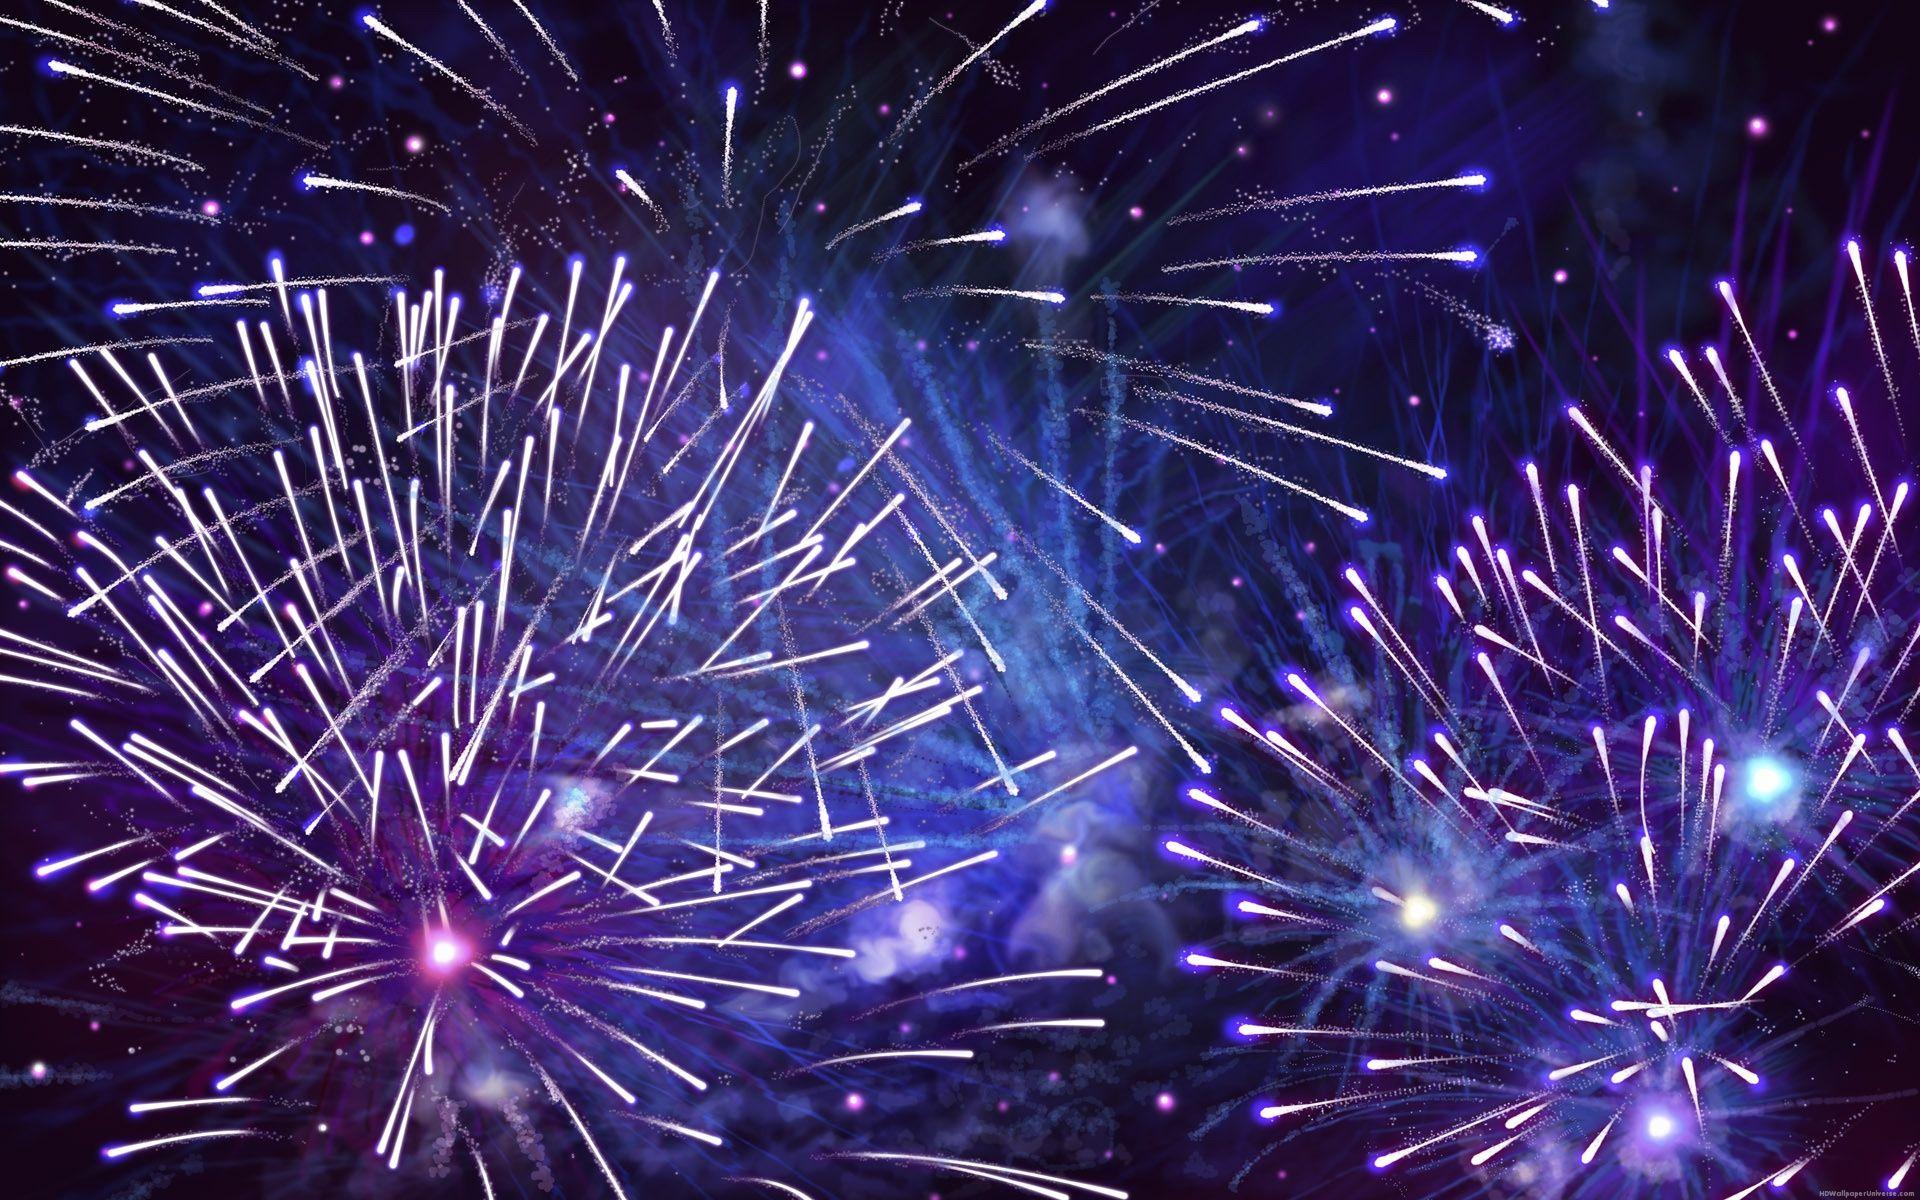 Happy New Year Fireworks Hd Wallpaper Http Www Hdwallpaperuniverse Com Happy New Year Fireworks Fireworks Wallpaper Fireworks Background New Year Fireworks